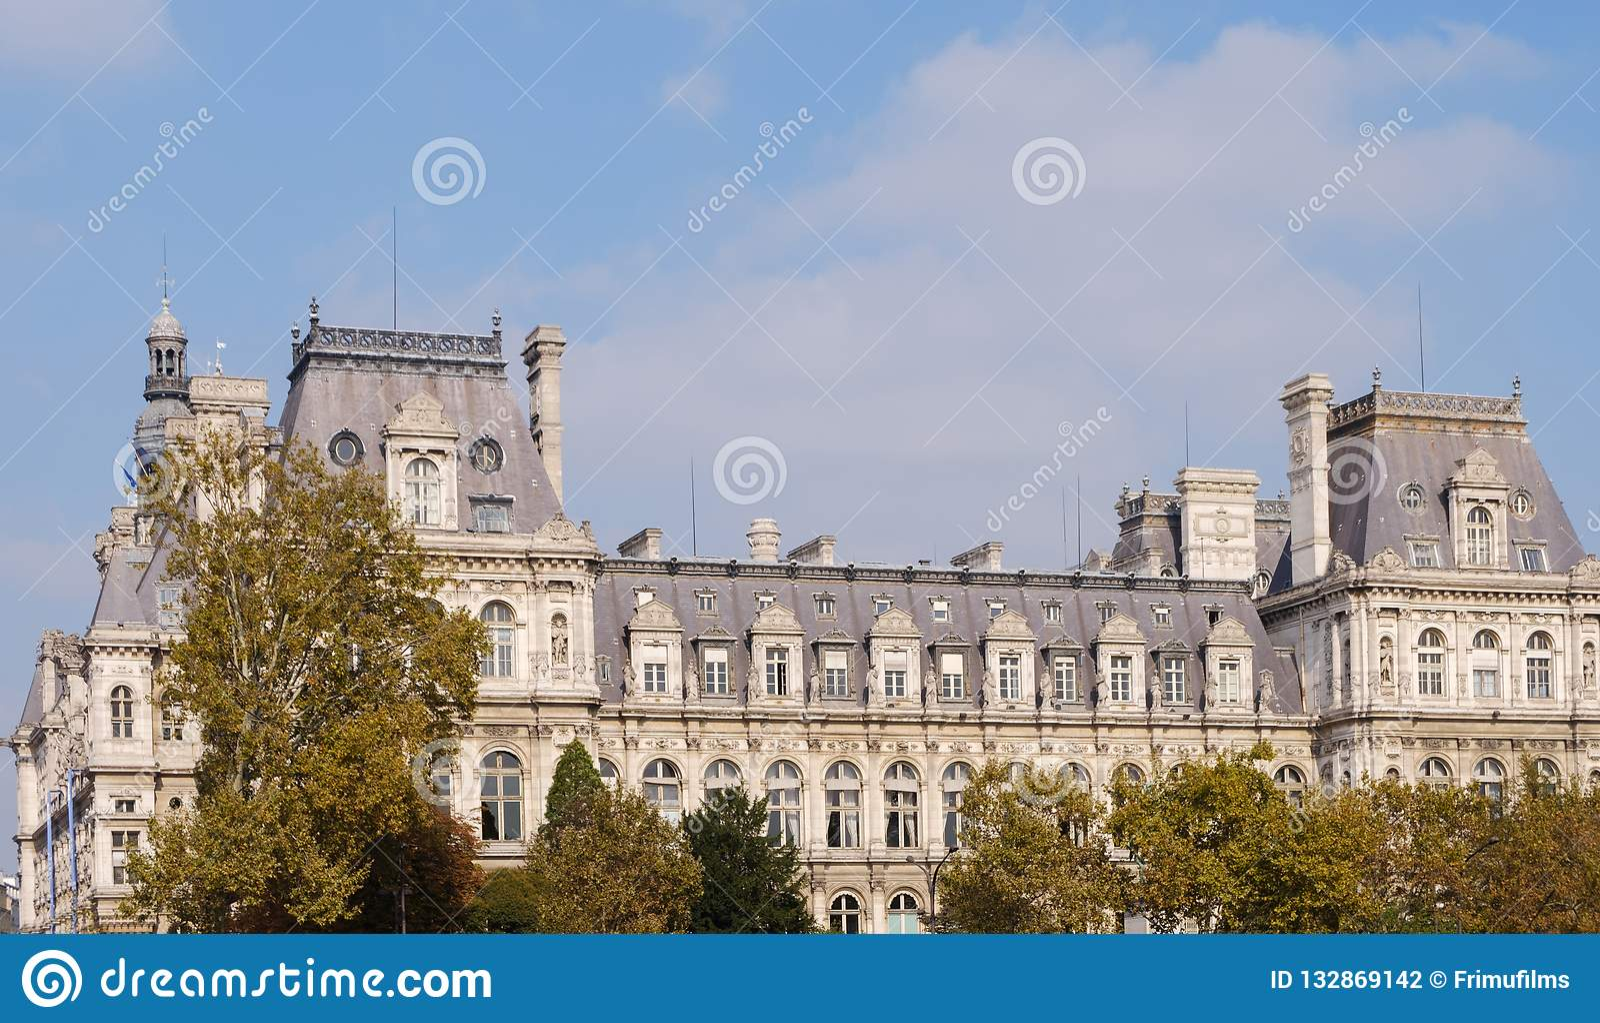 барочная архитектура здания